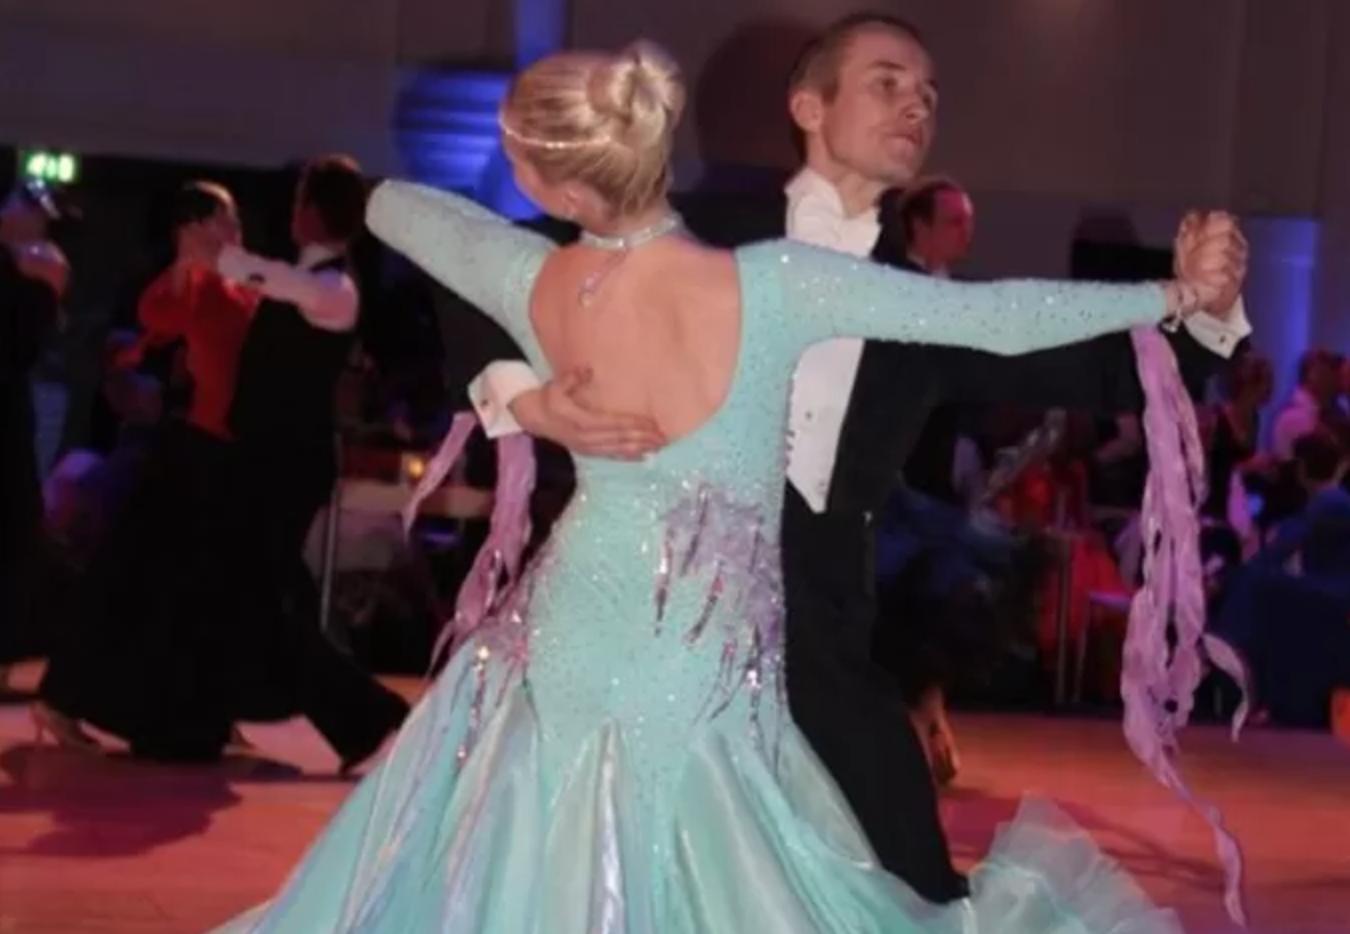 Gaaf! Thomas en Djoeke uit Almelo mogen eigen dans opvoeren in Grand Hotel Wien in Wenen